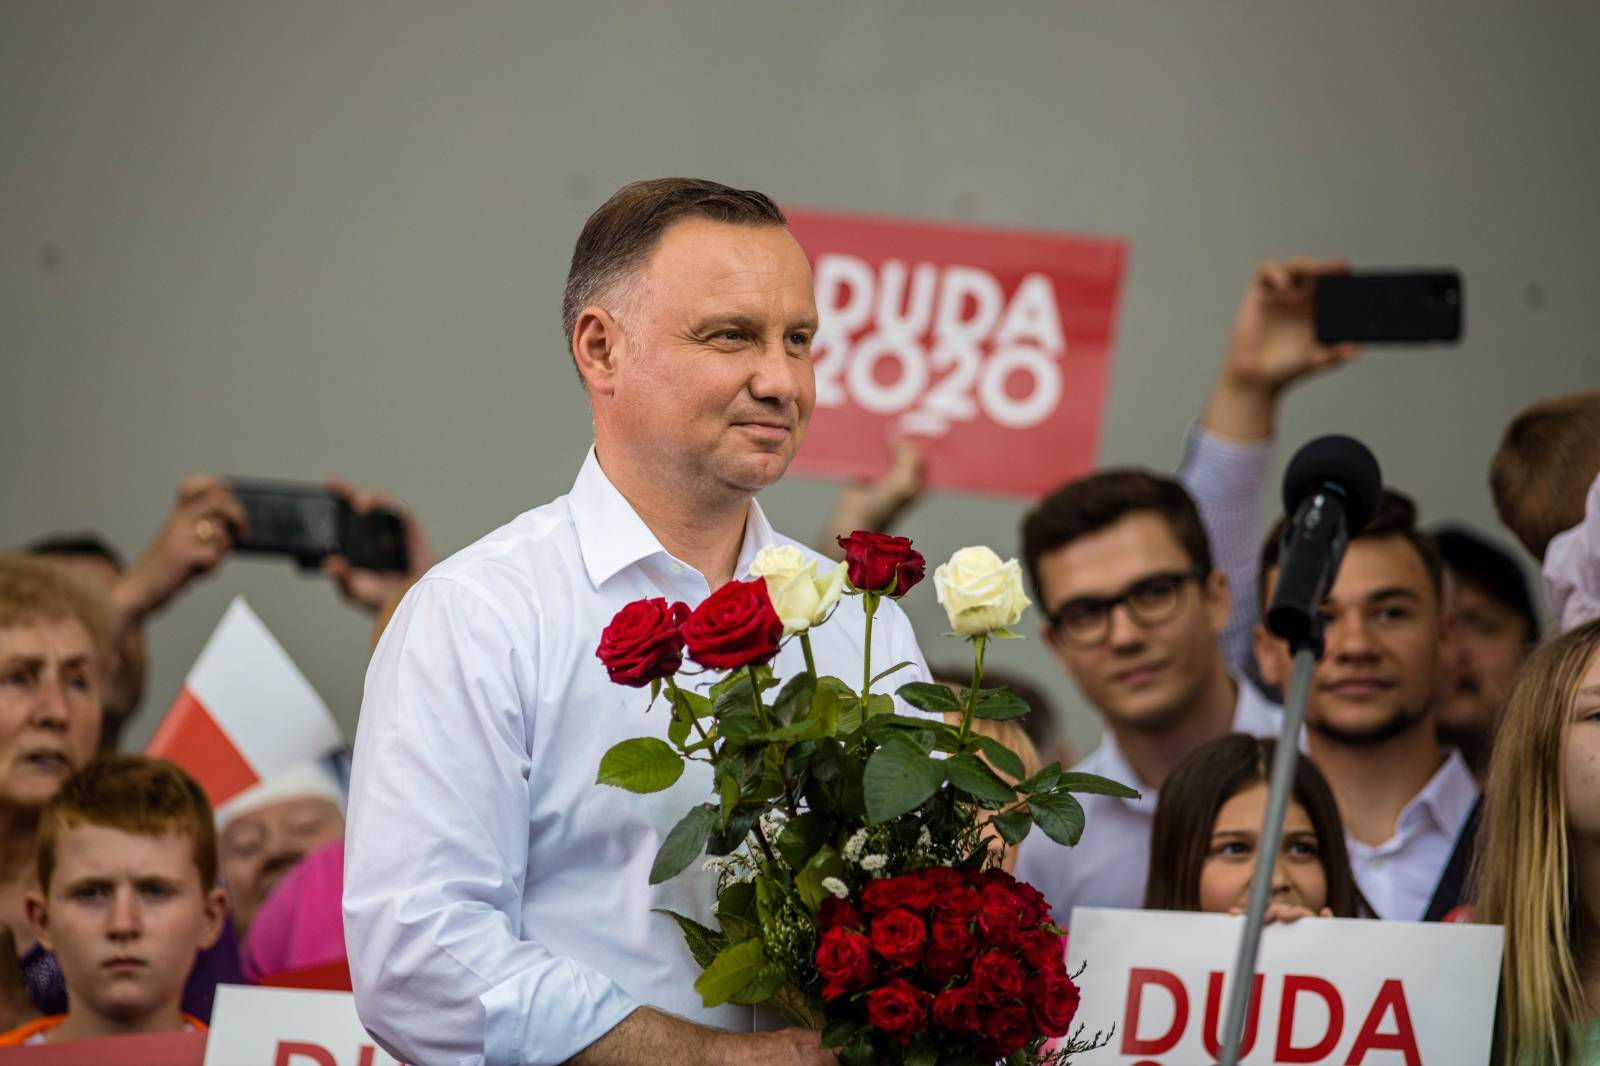 Polish President Andrzej Duda smiles during his election rally in Kwidzyn